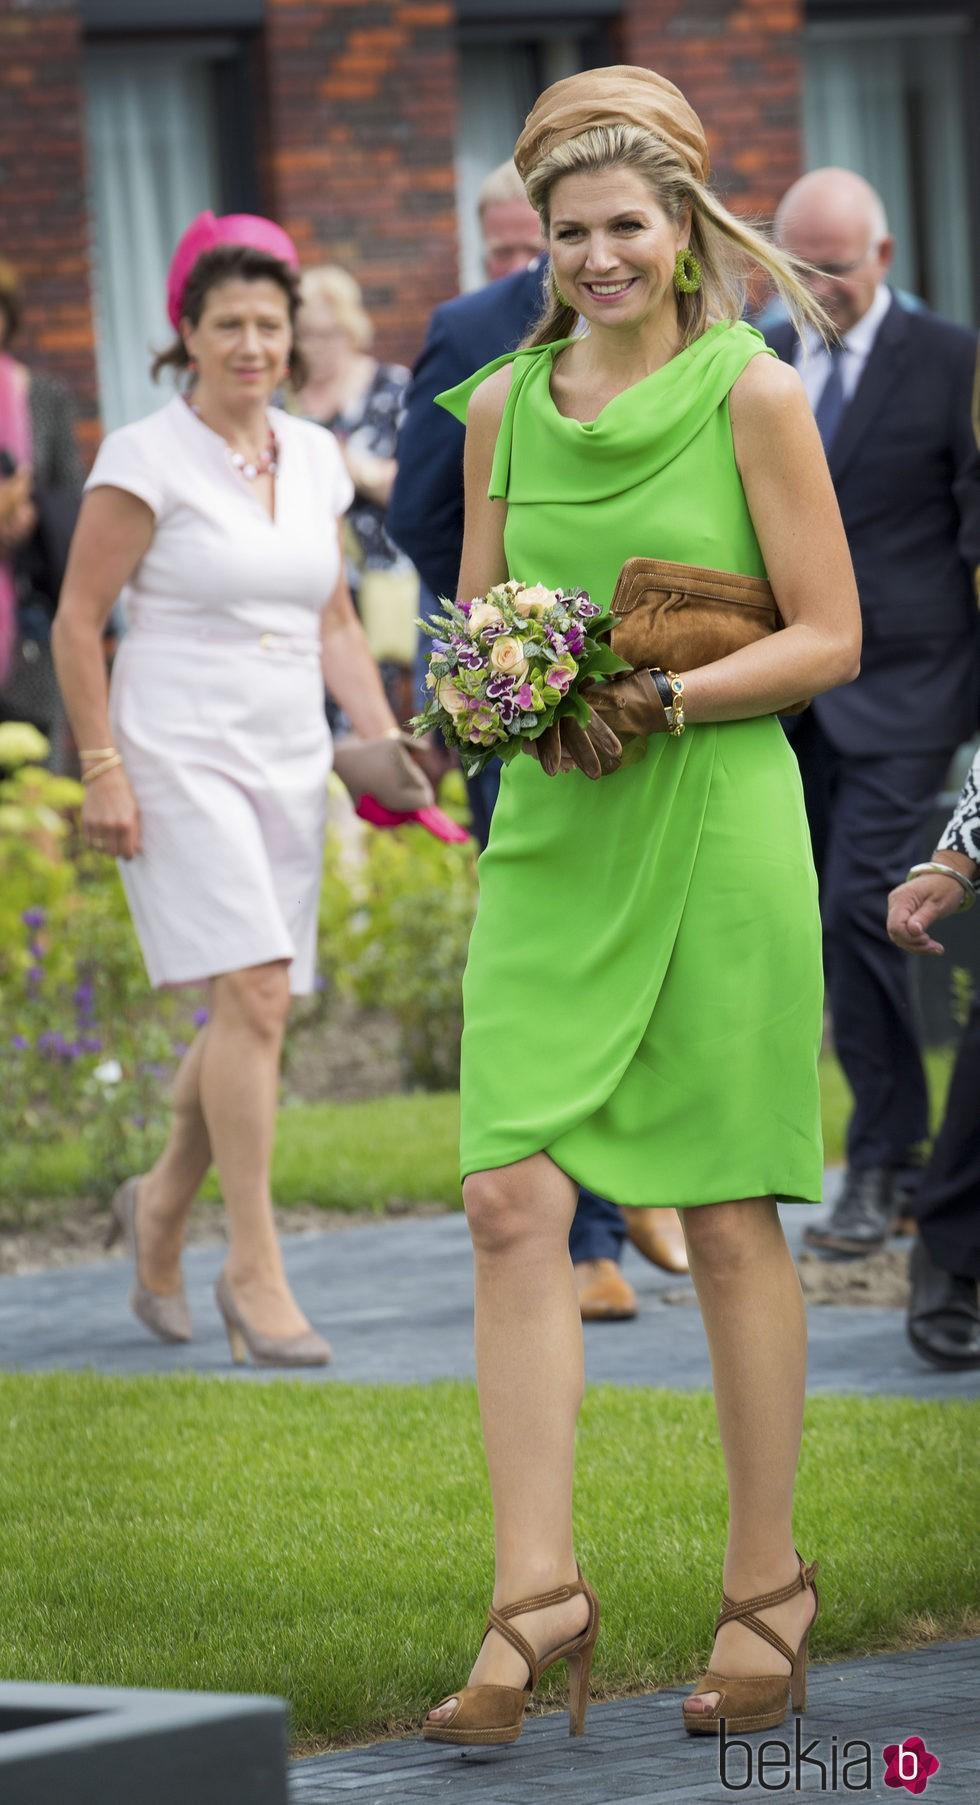 76769_reina-maxima-holanda-veraniego-vestido-verde-manzana.jpg